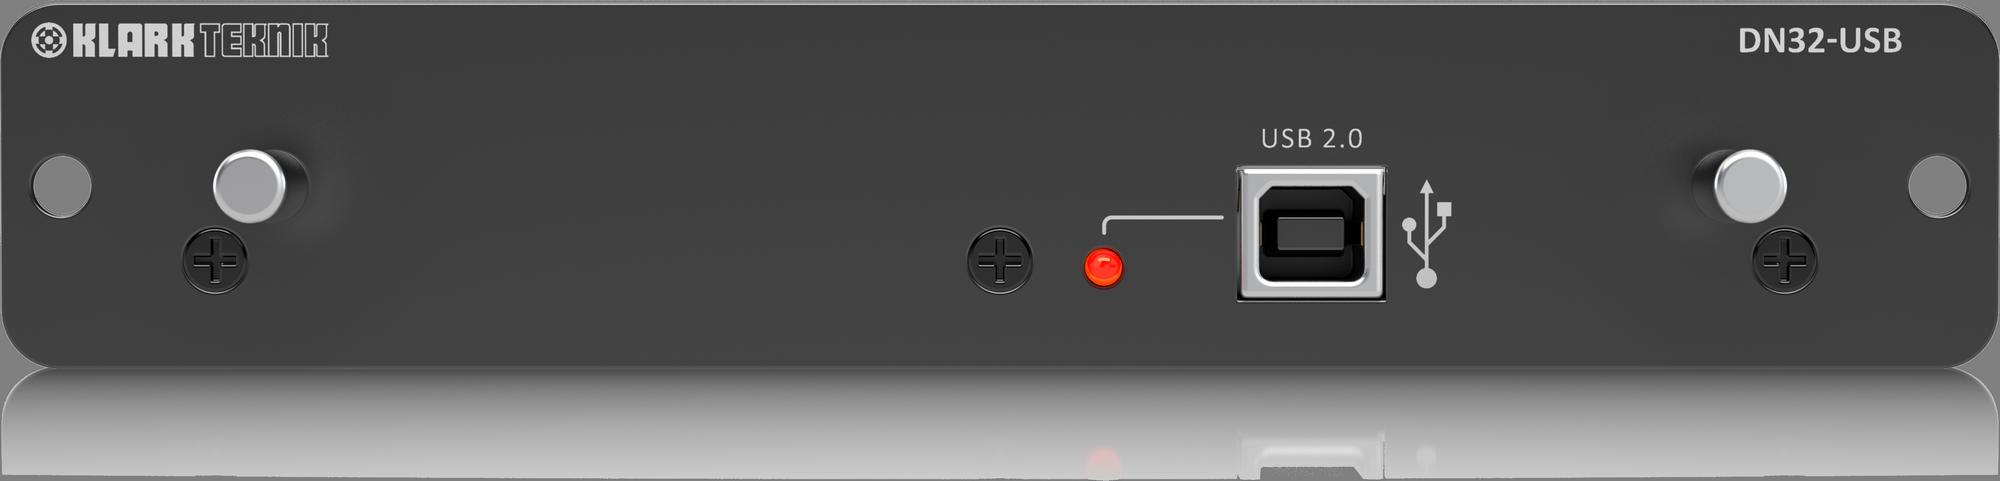 Klark Teknik DN32-USB - Module d'extension